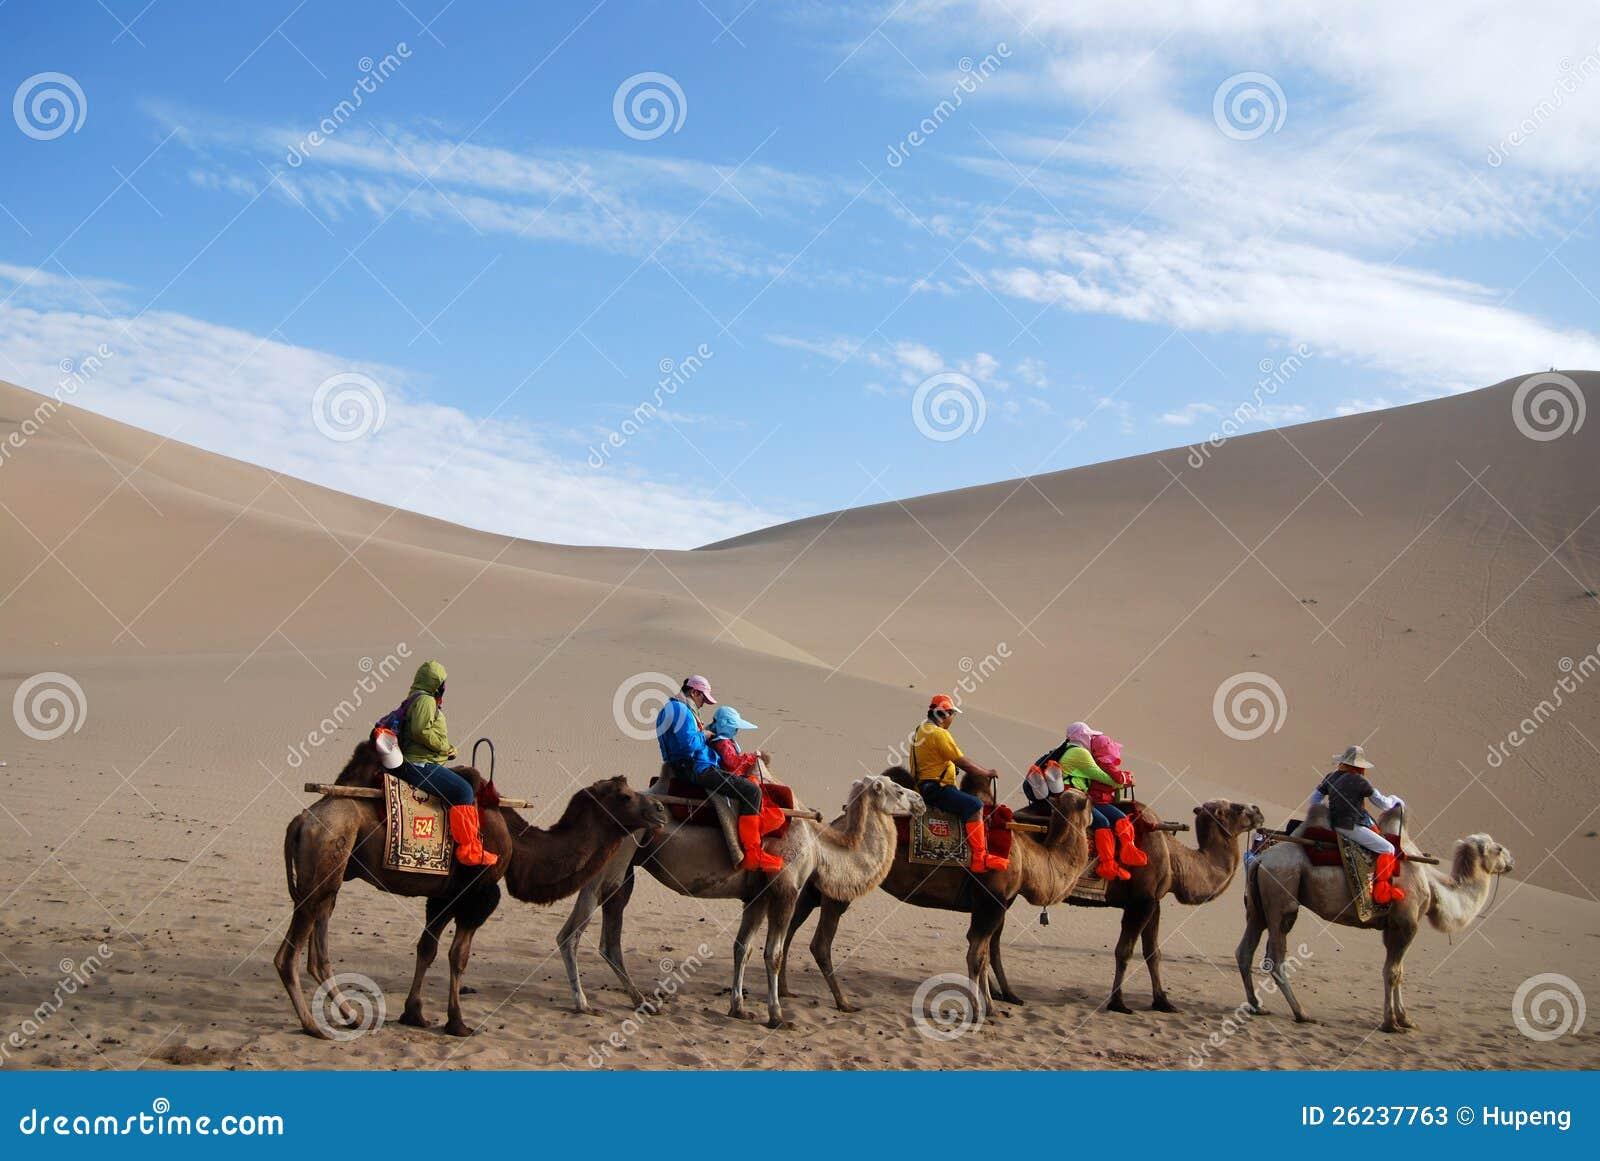 Camel Caravan In The Desert Editorial Stock Photo - Image ...